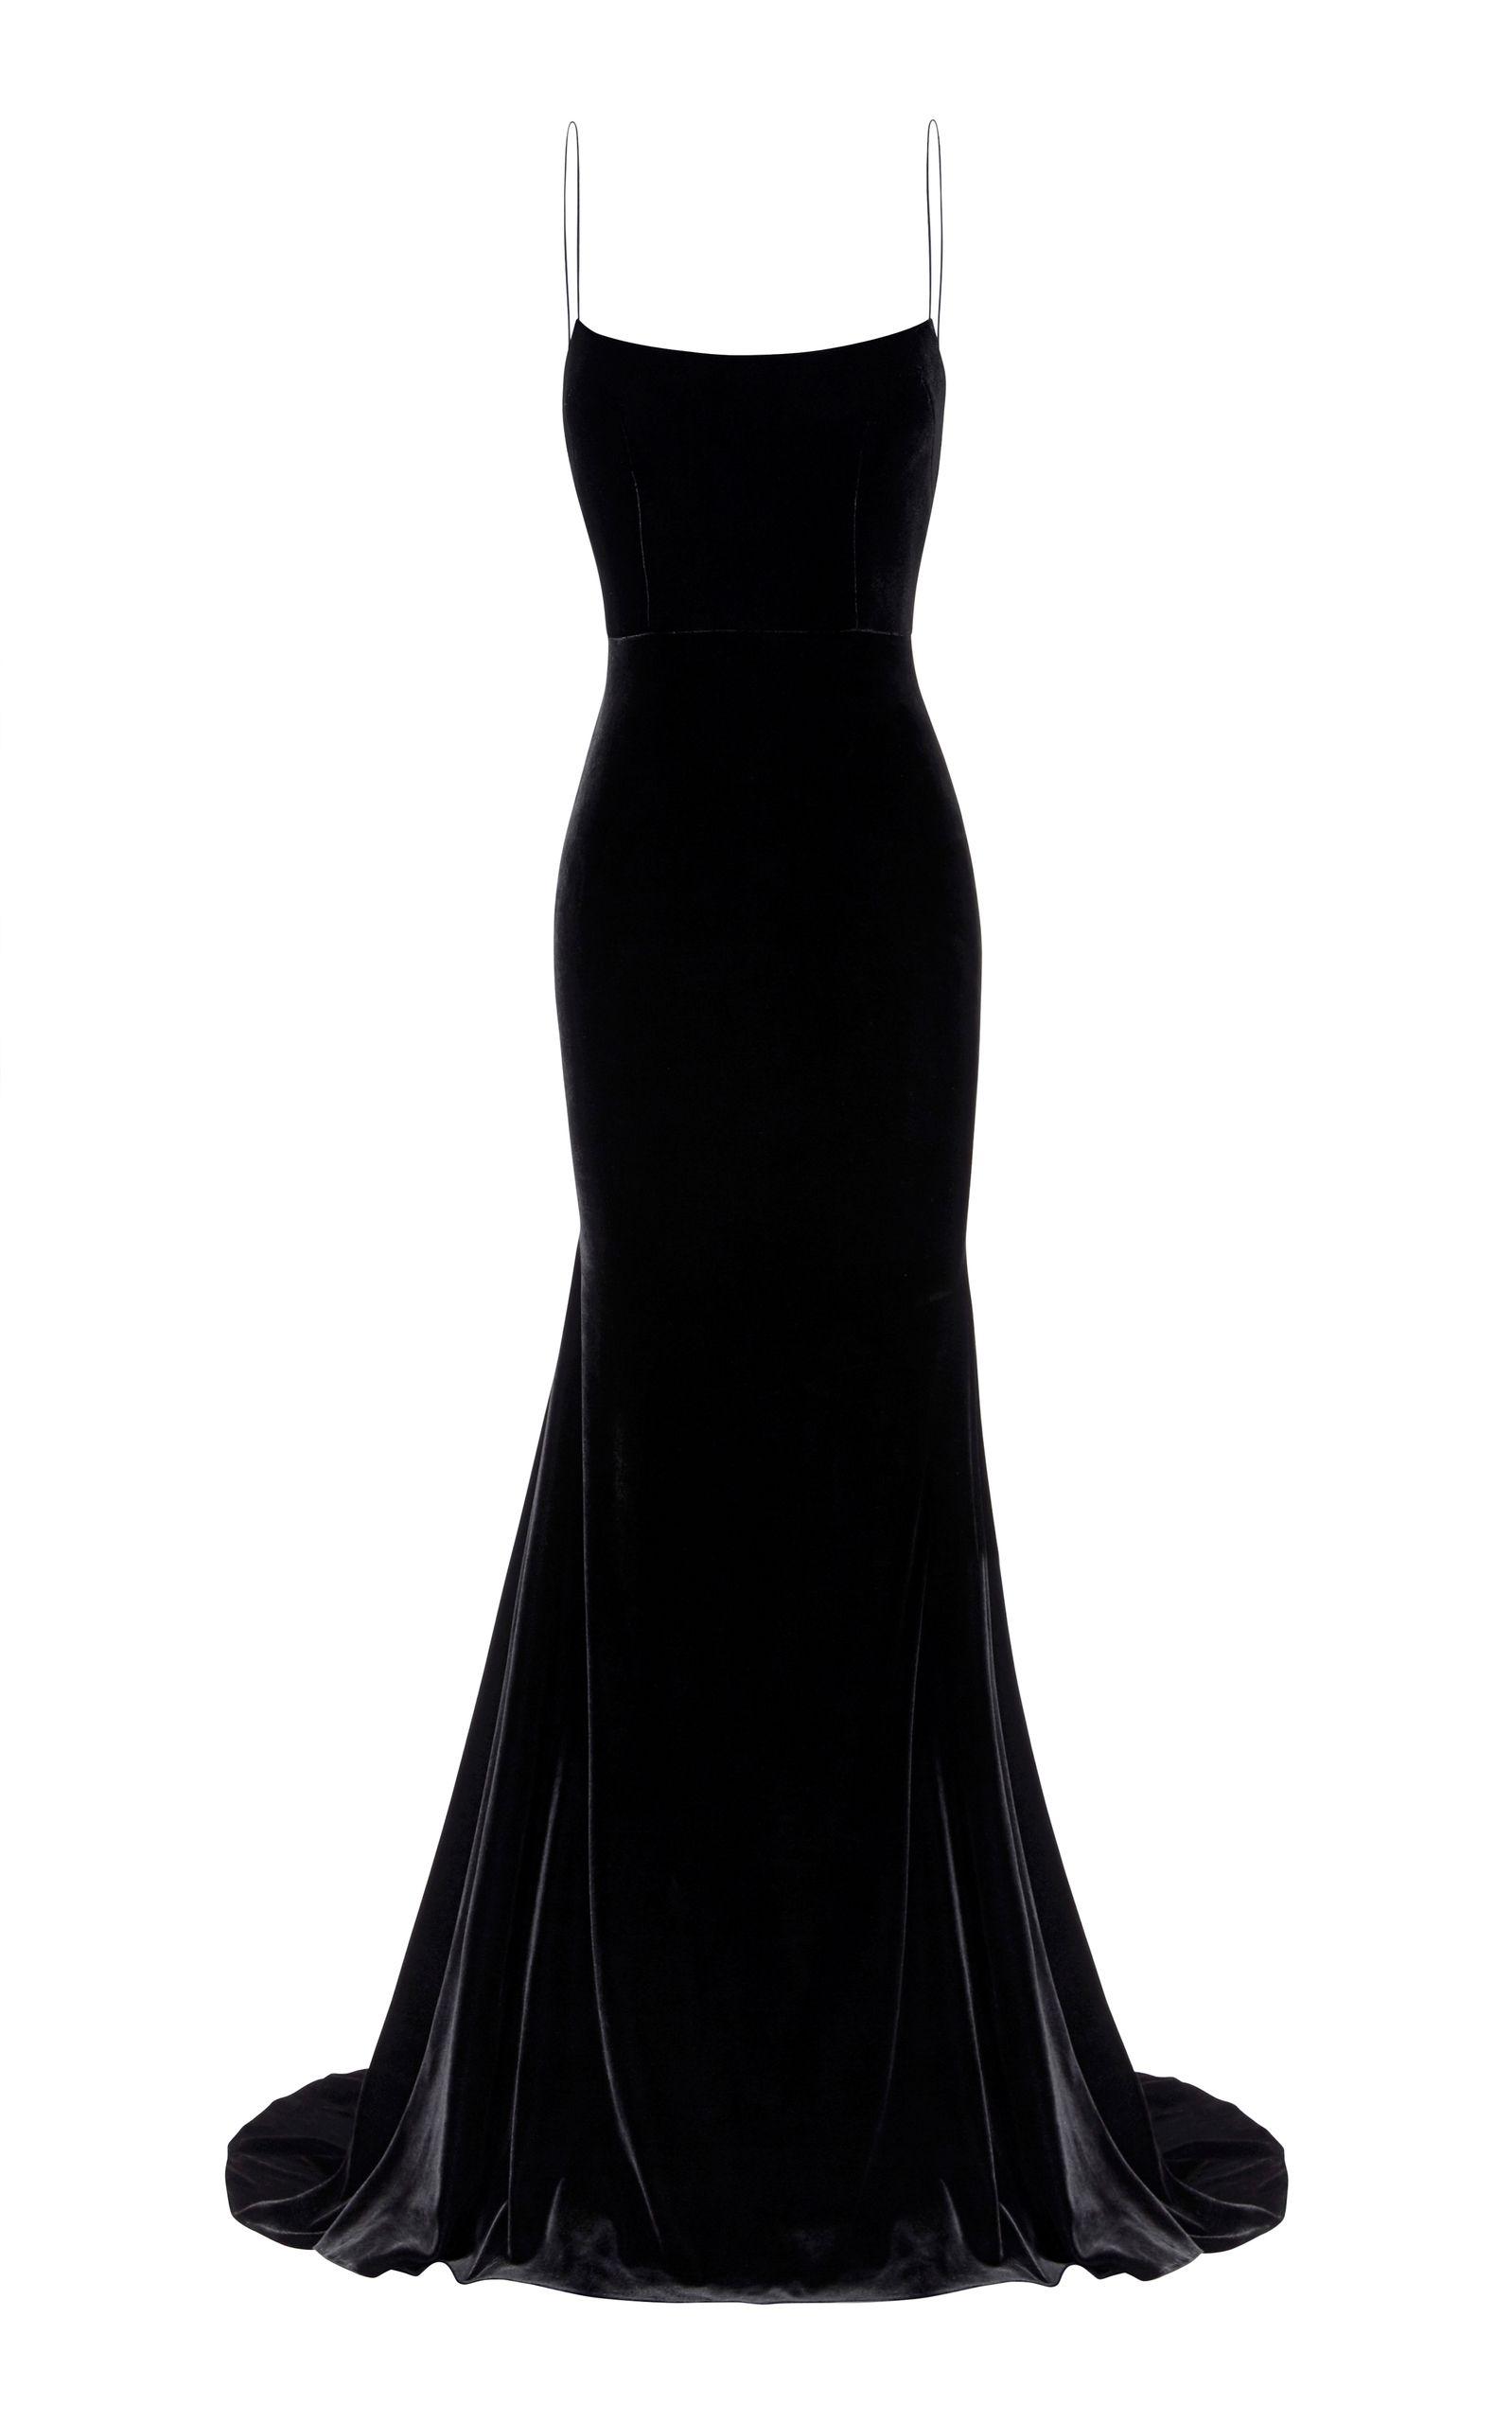 Kim Velvet Slip Dress by ALEX PERRY for Preorder on Moda Operandi ...